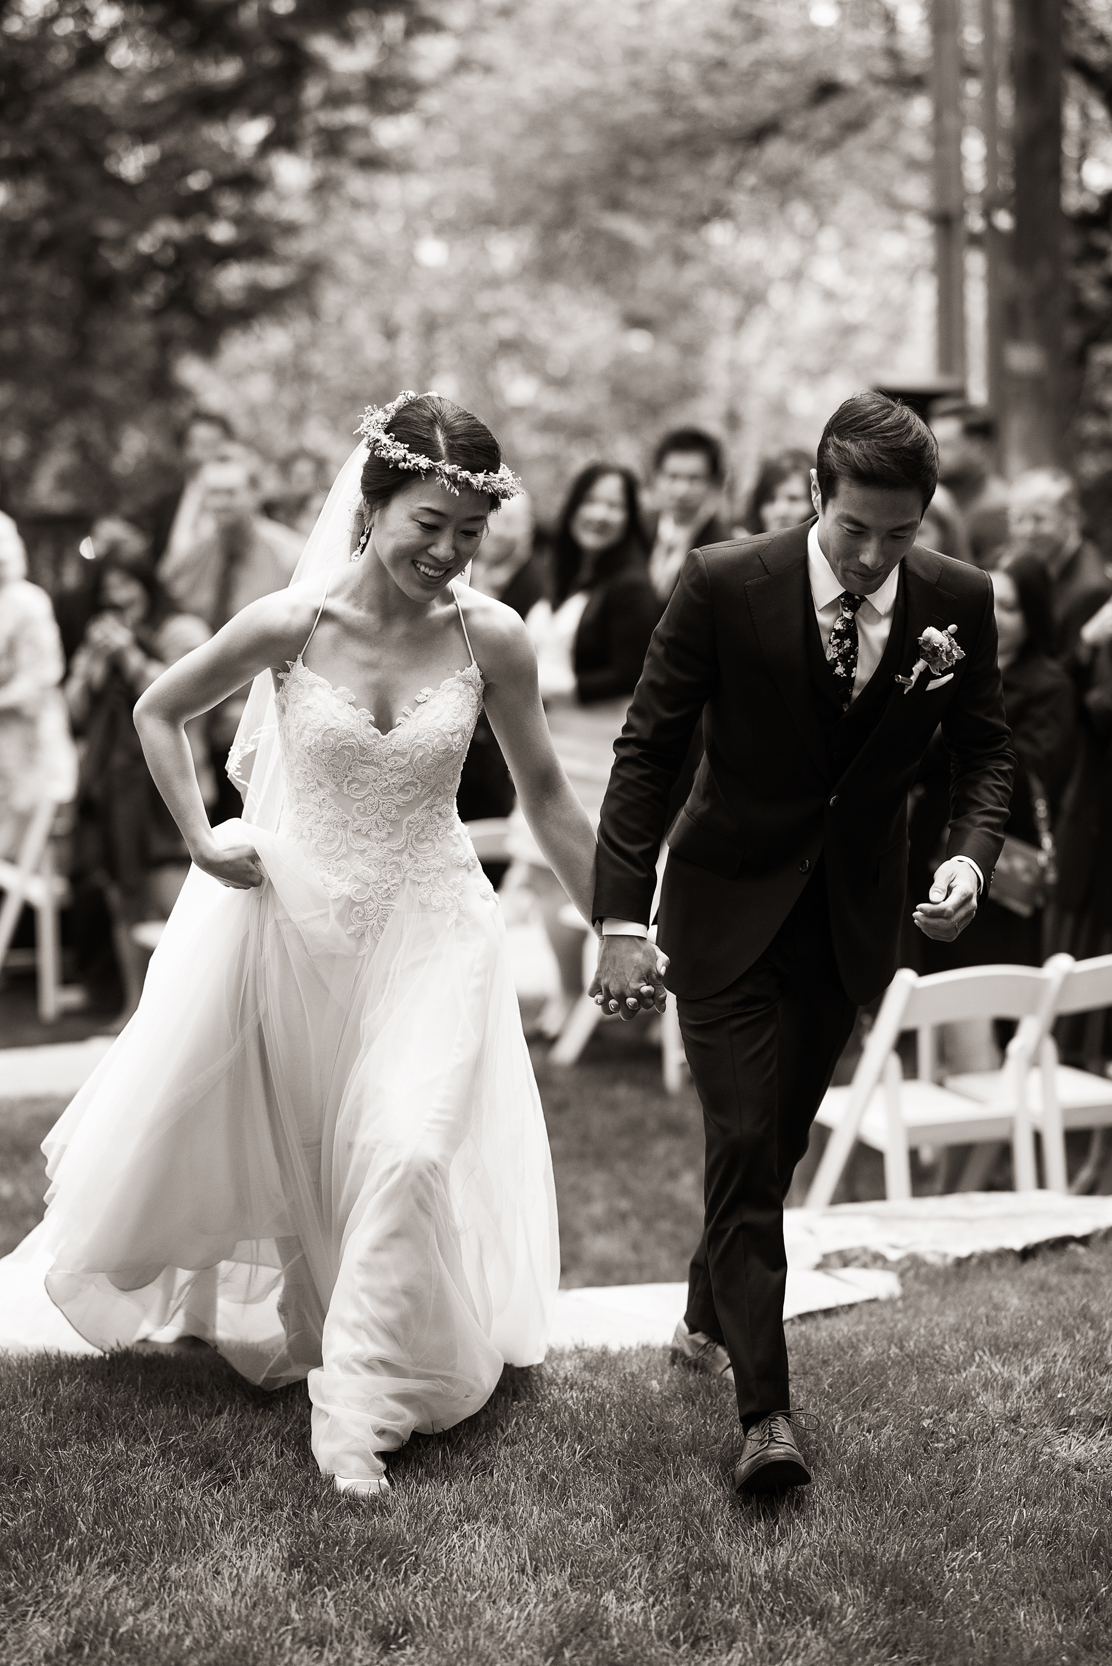 creative black and white wedding ceremony